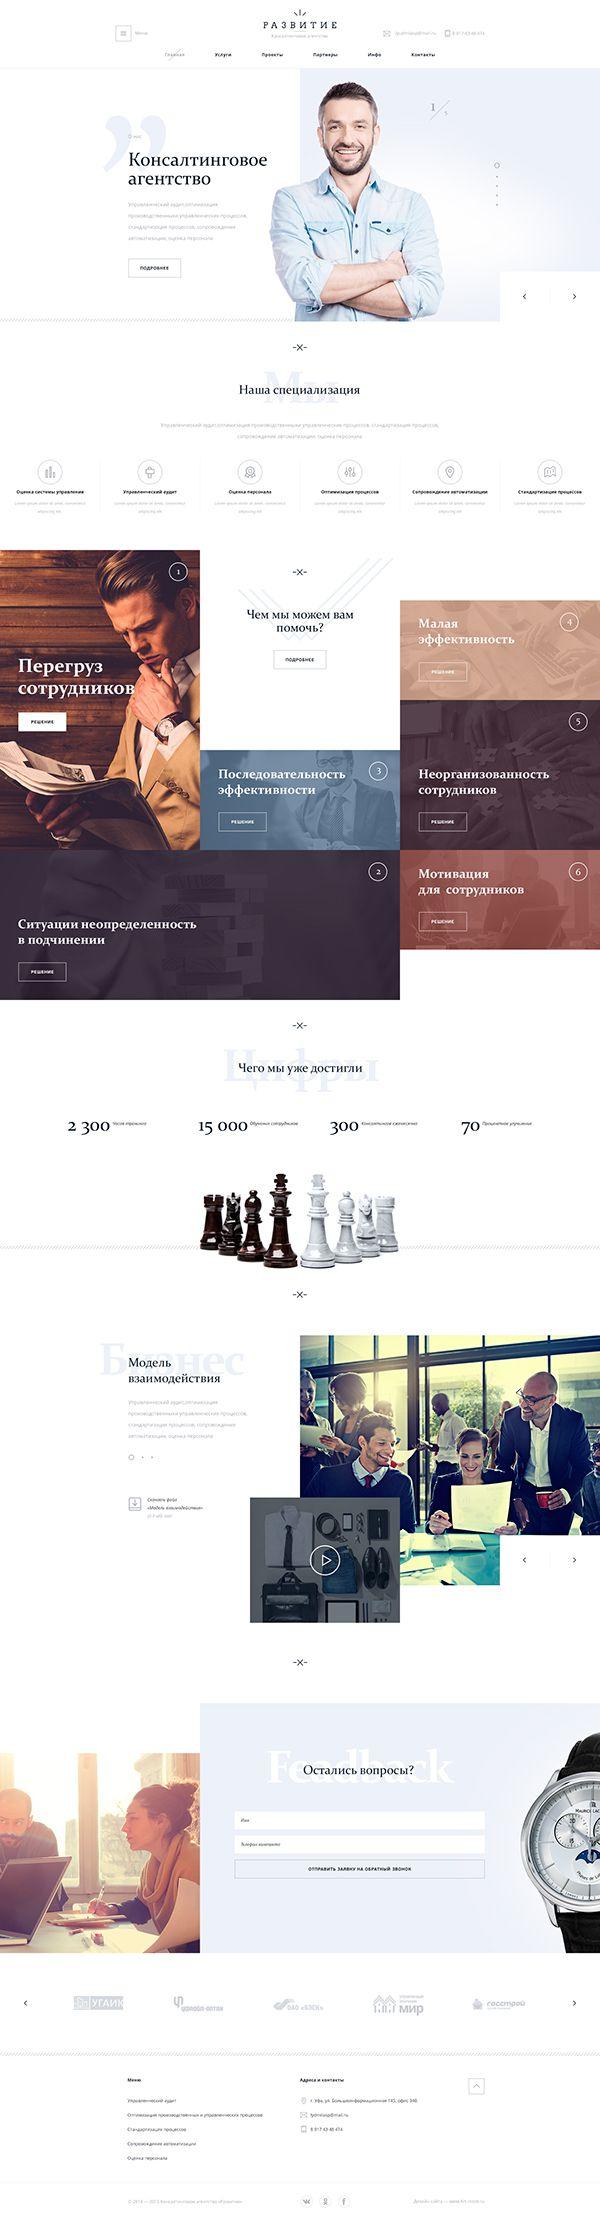 Razvitie | School Advisory Councils on Web Design Served